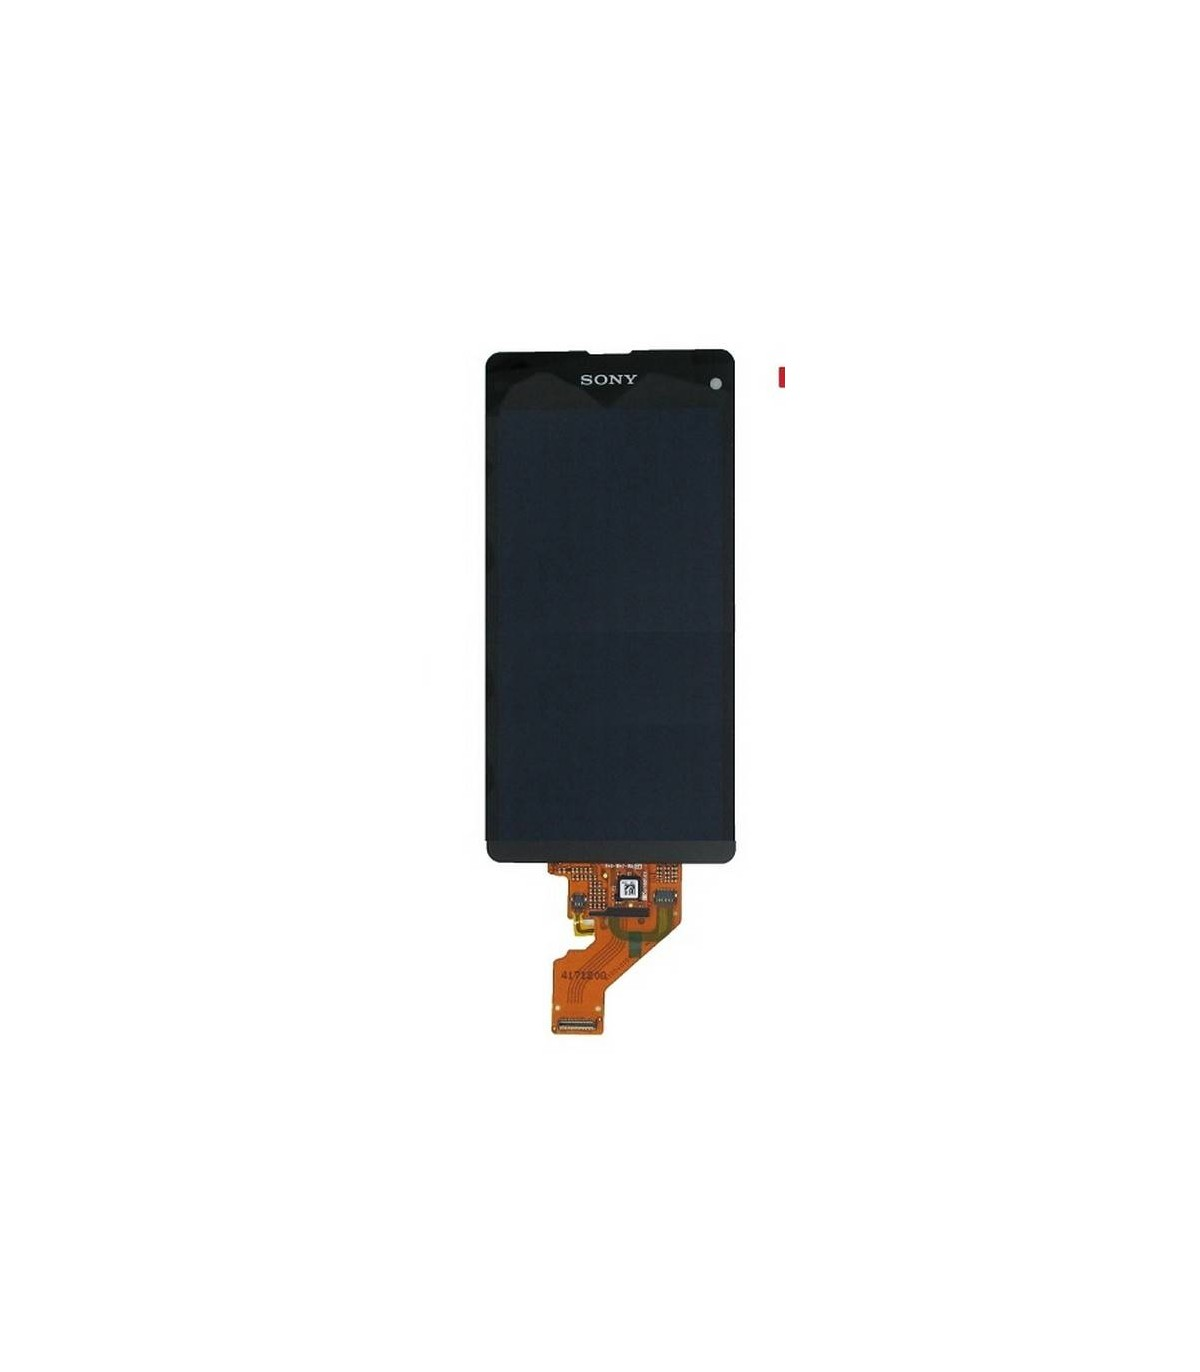 pantalla completa sony xperia z1 Compact D5503